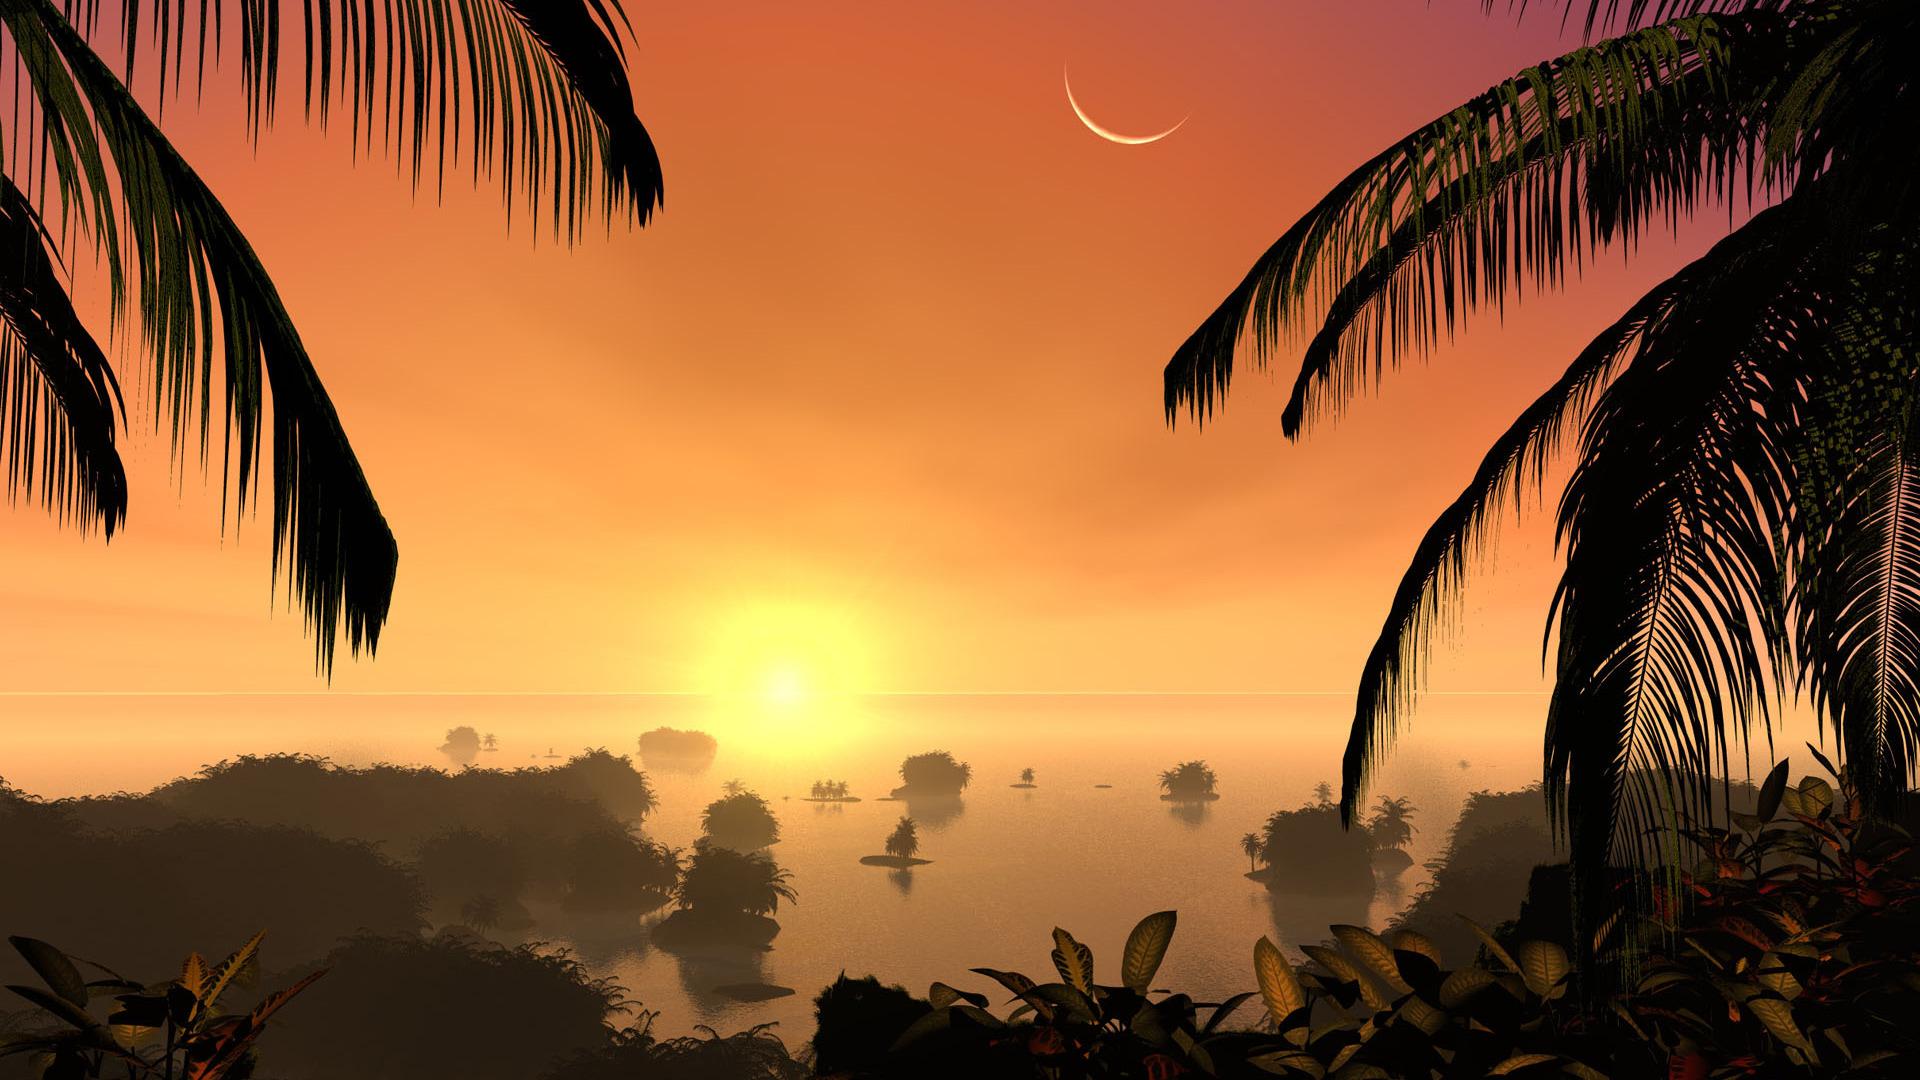 comwallpapersdigital artsunset on a tropical island 7206html 1920x1080